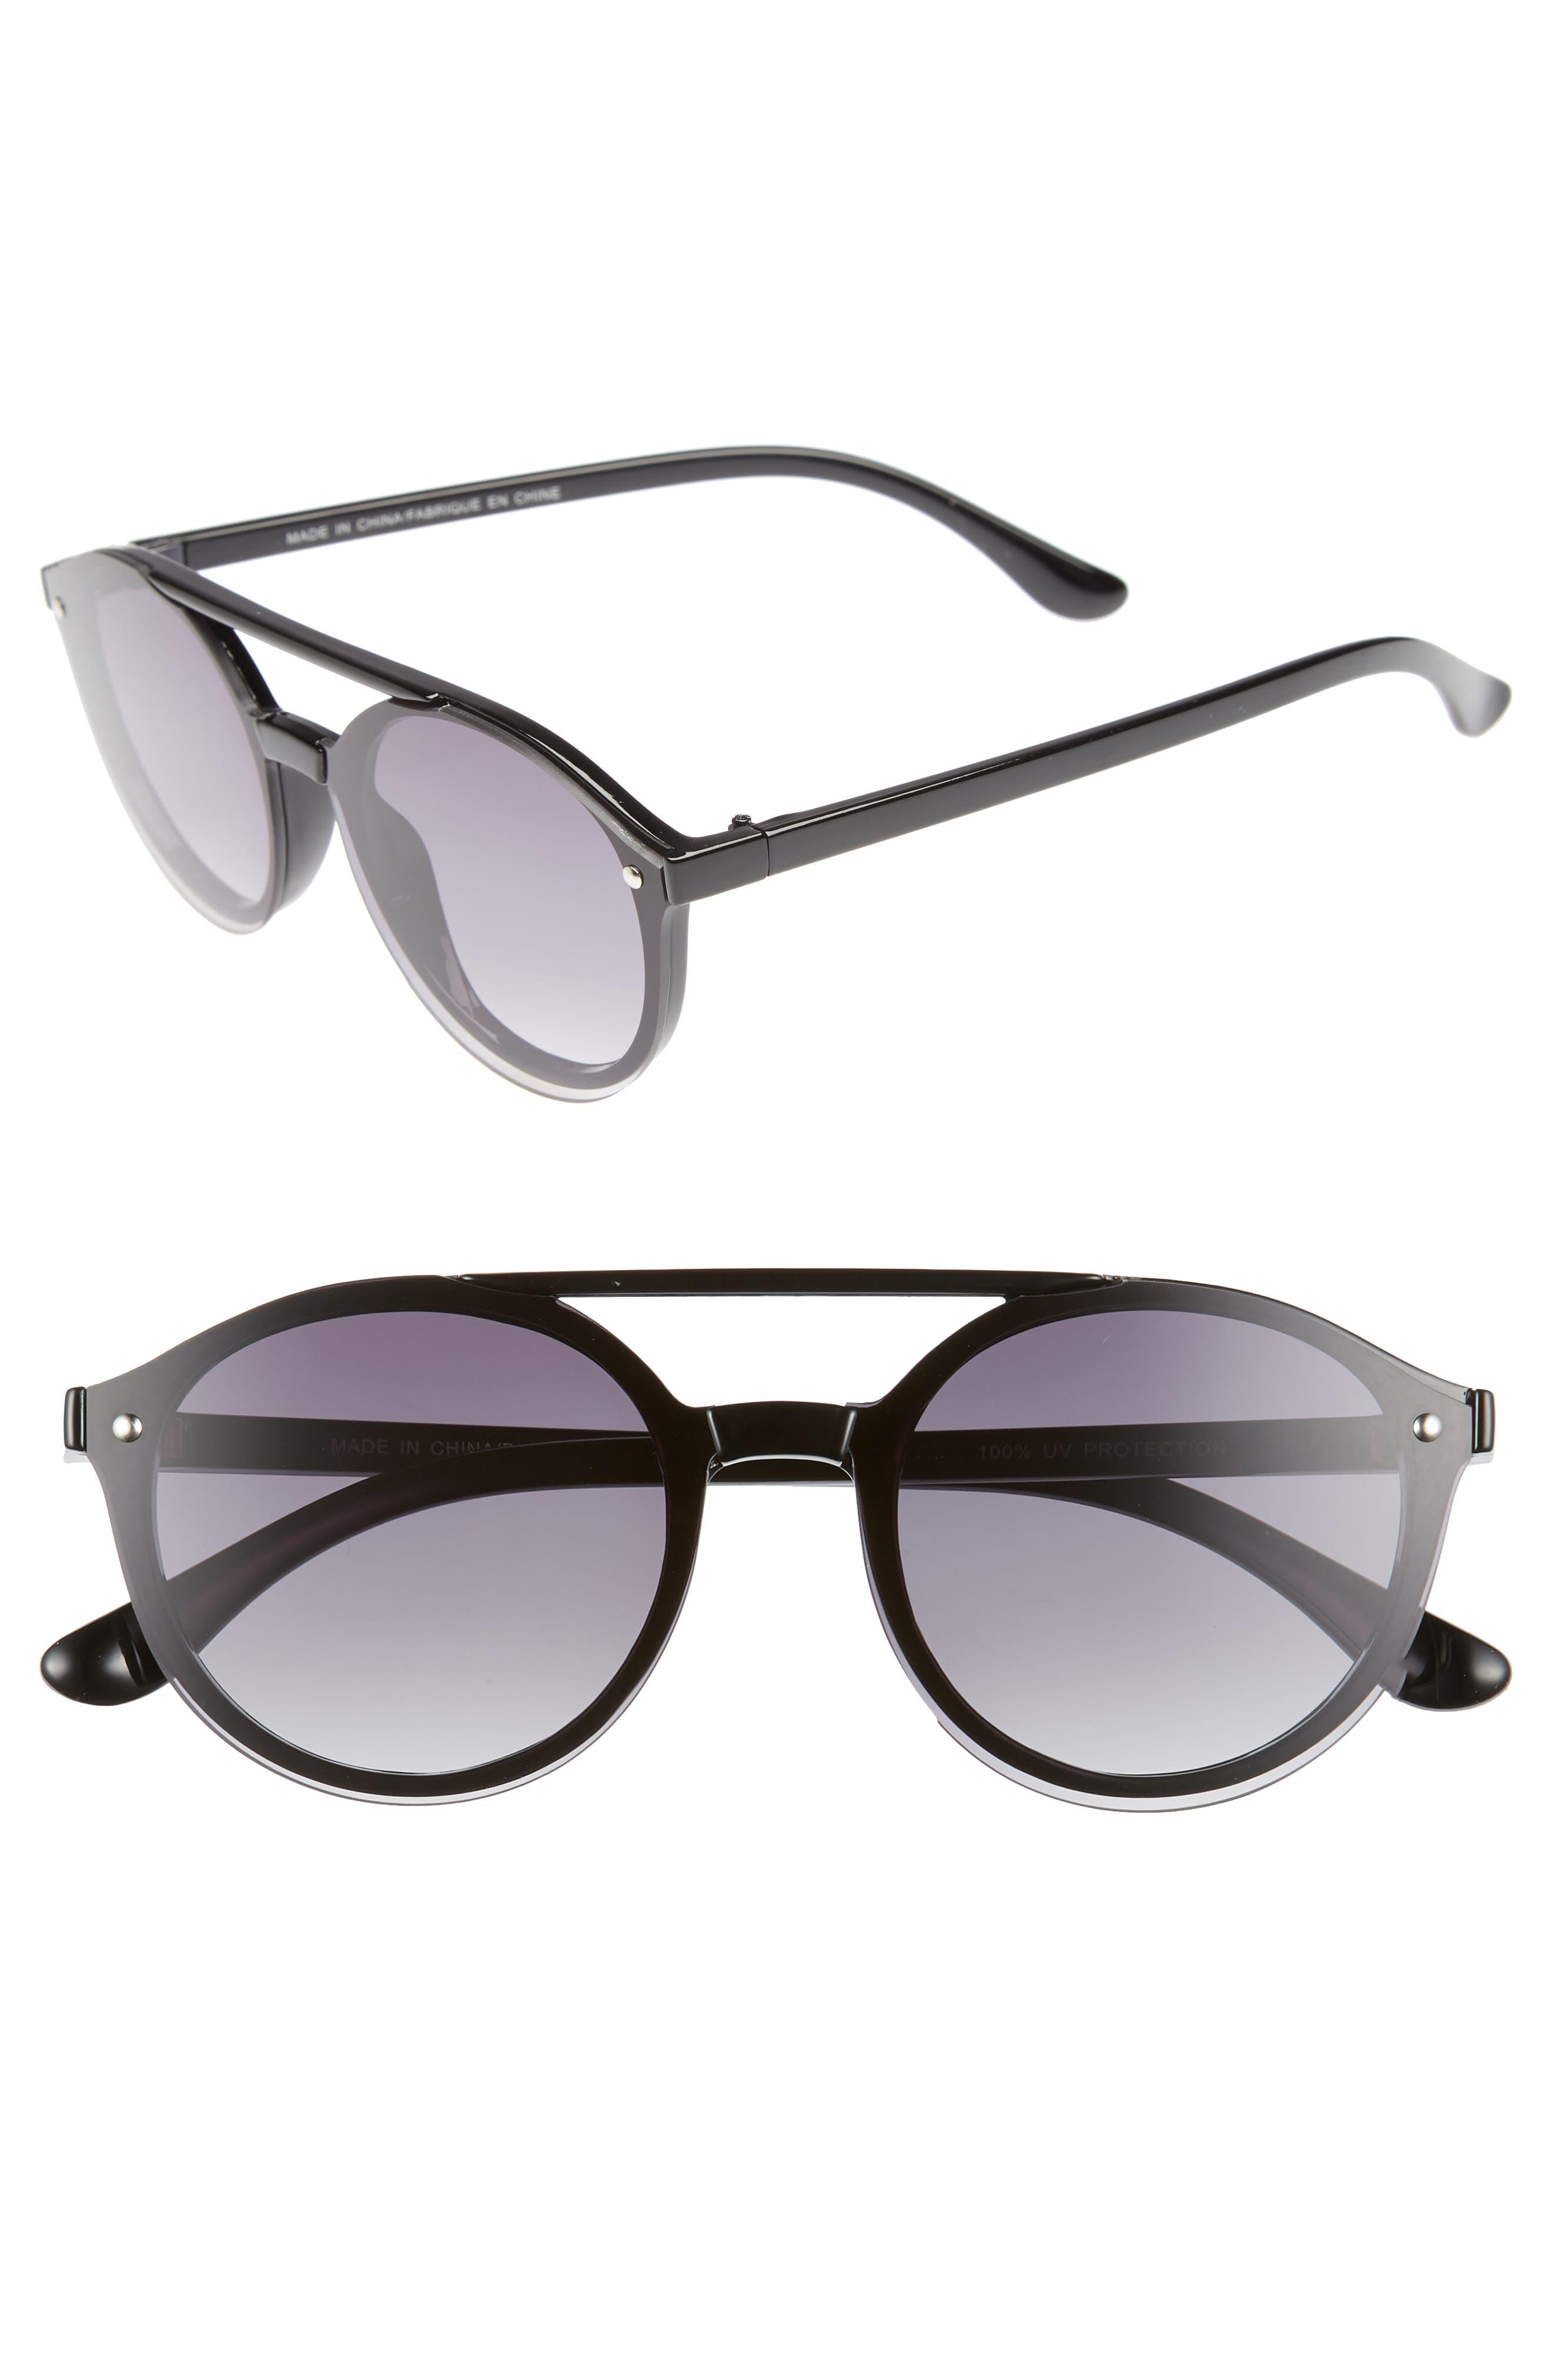 49mm Small Aviator Sunglasses,                             Main thumbnail 1, color,                             001